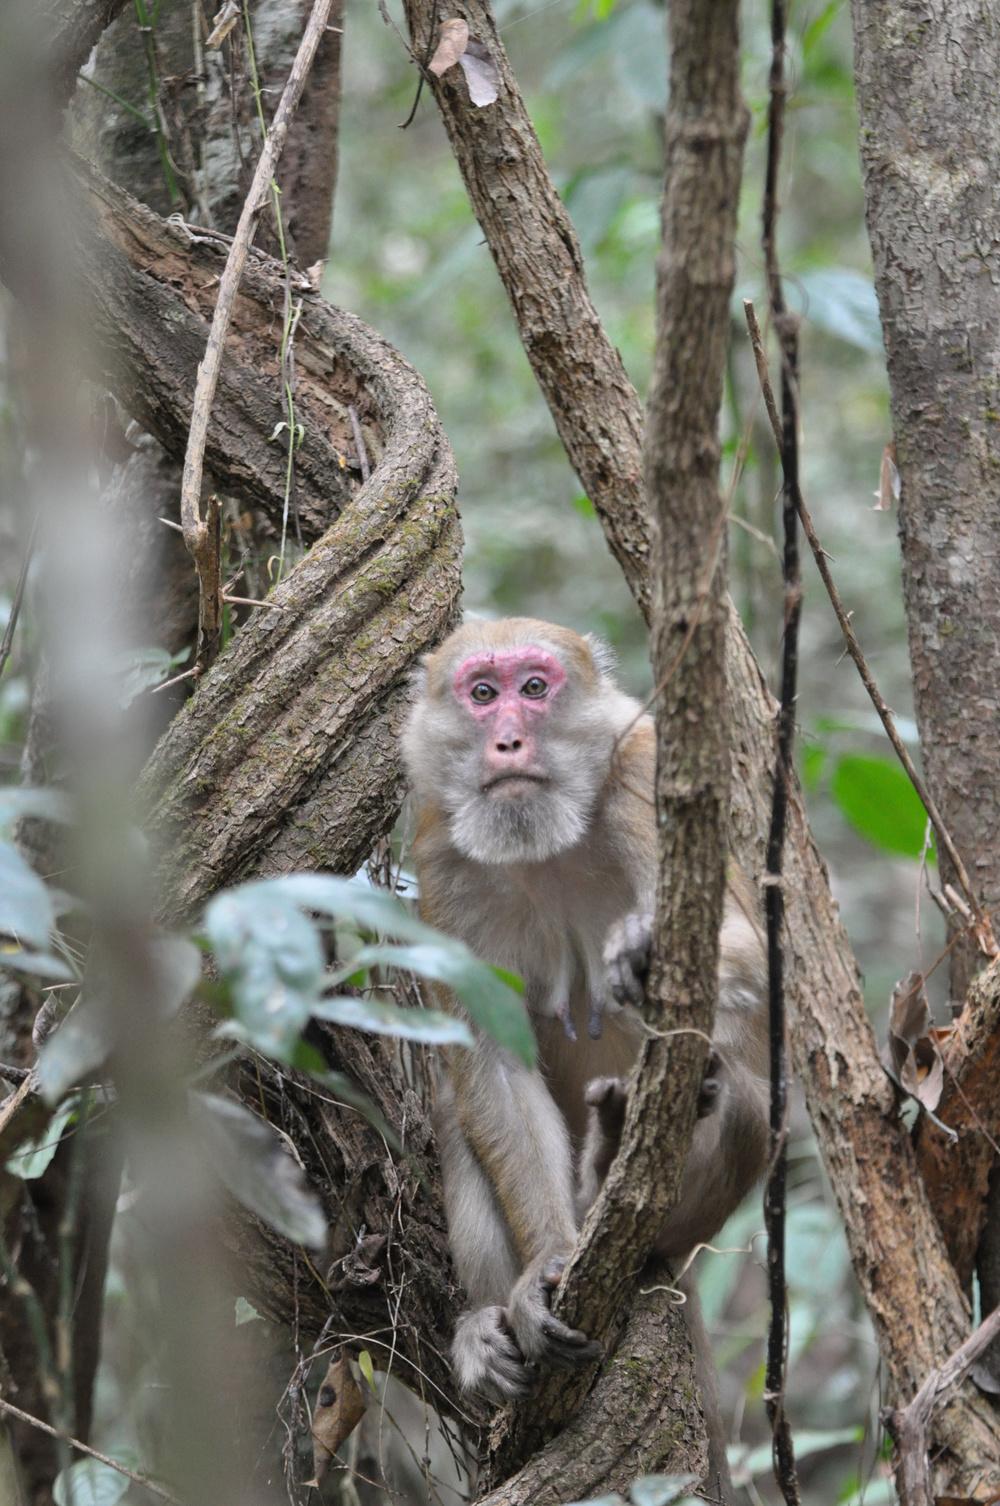 Female Assamese macaque